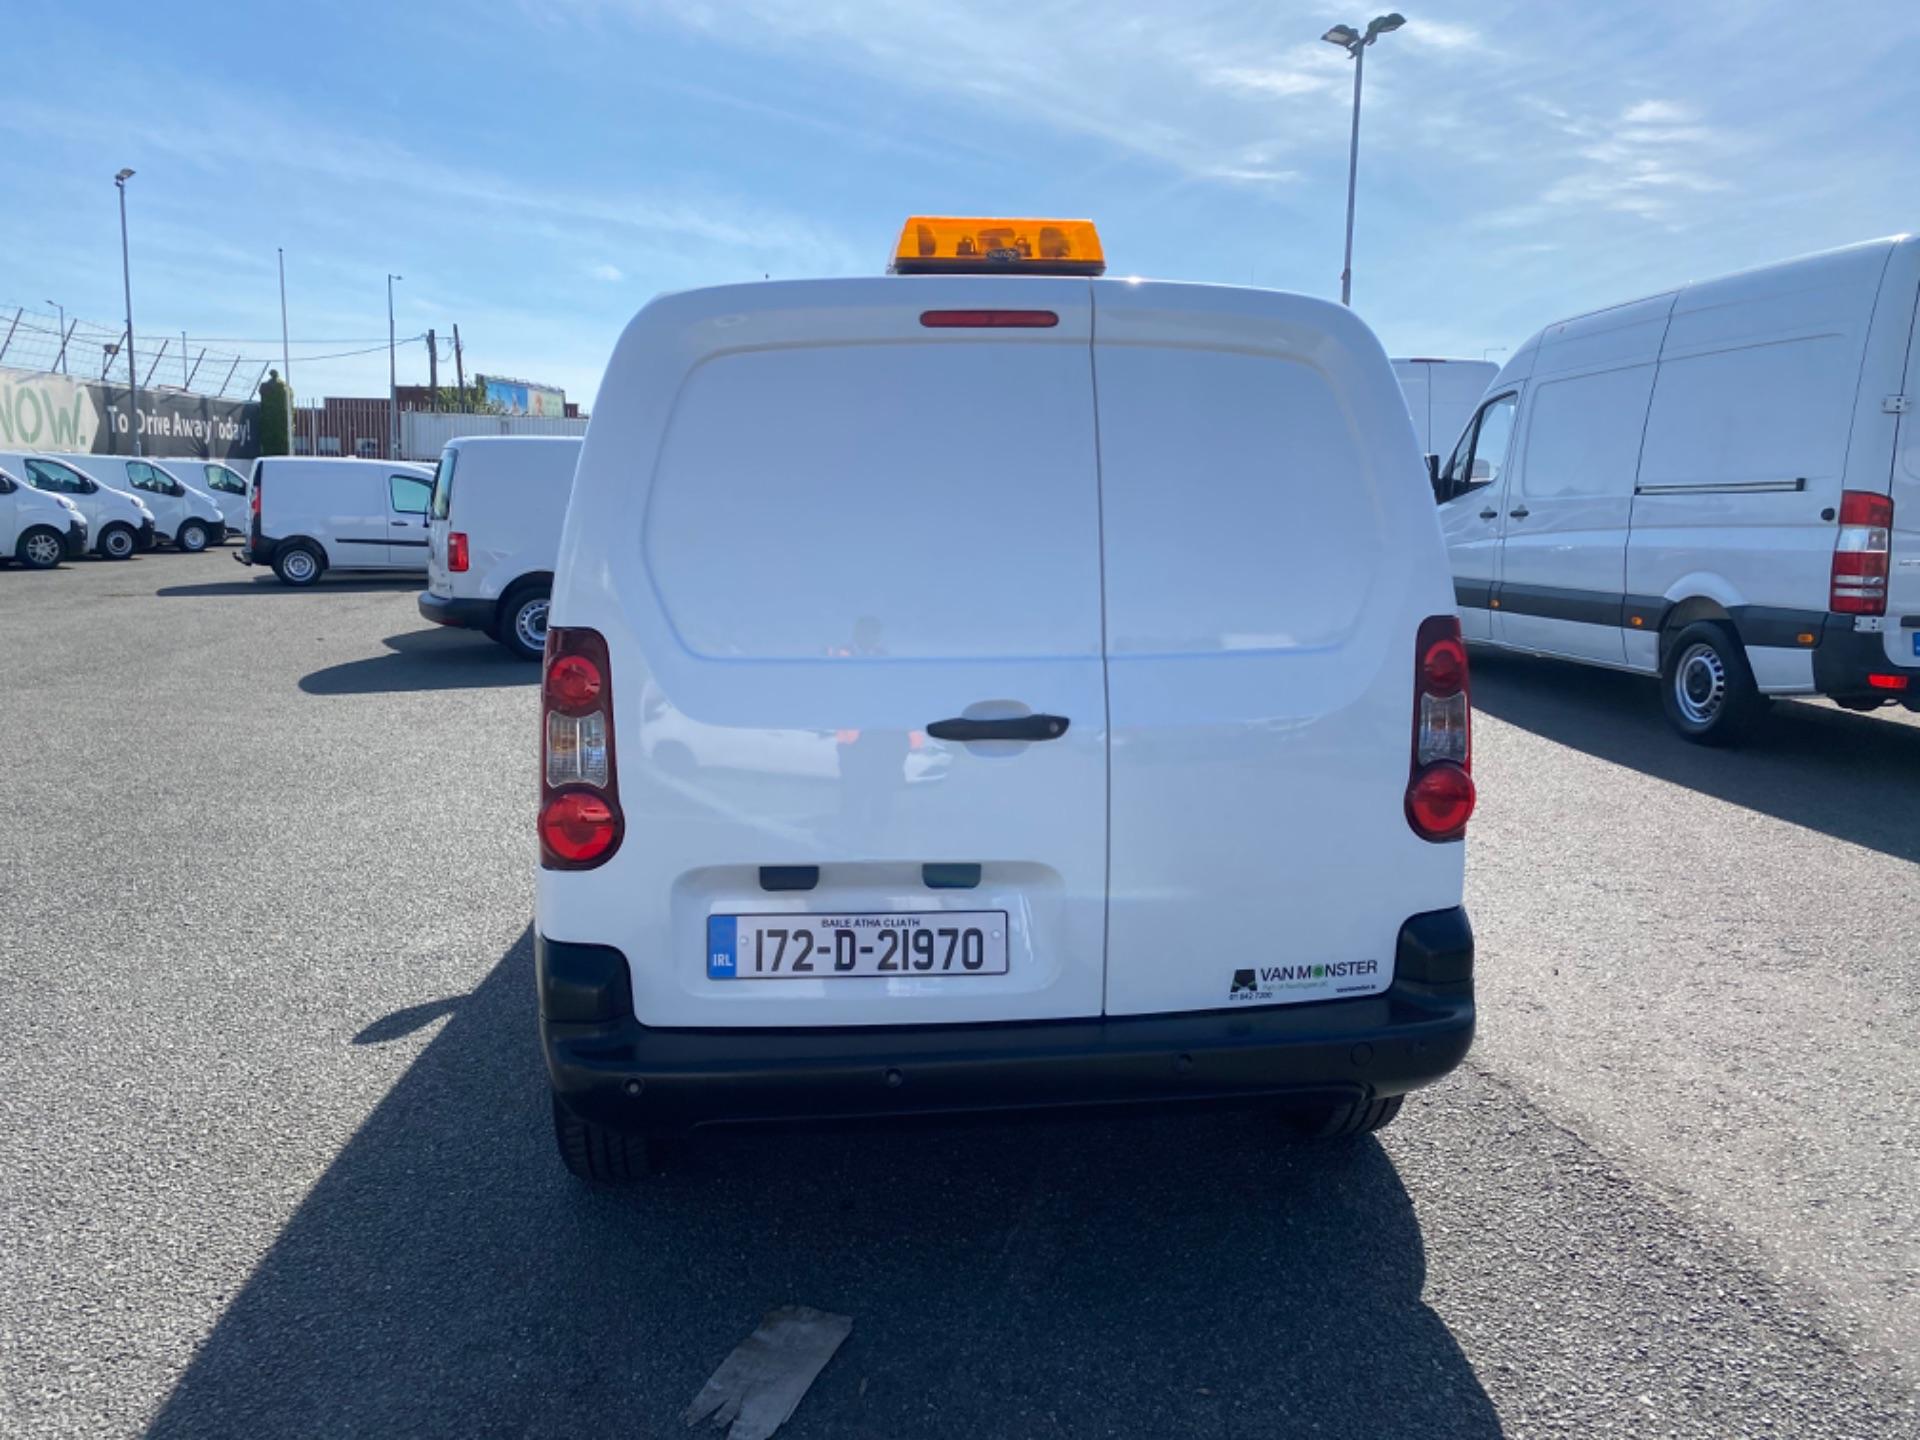 2017 Peugeot Partner Professional 1.6 Blue HDI 100 (172D21970) Image 6